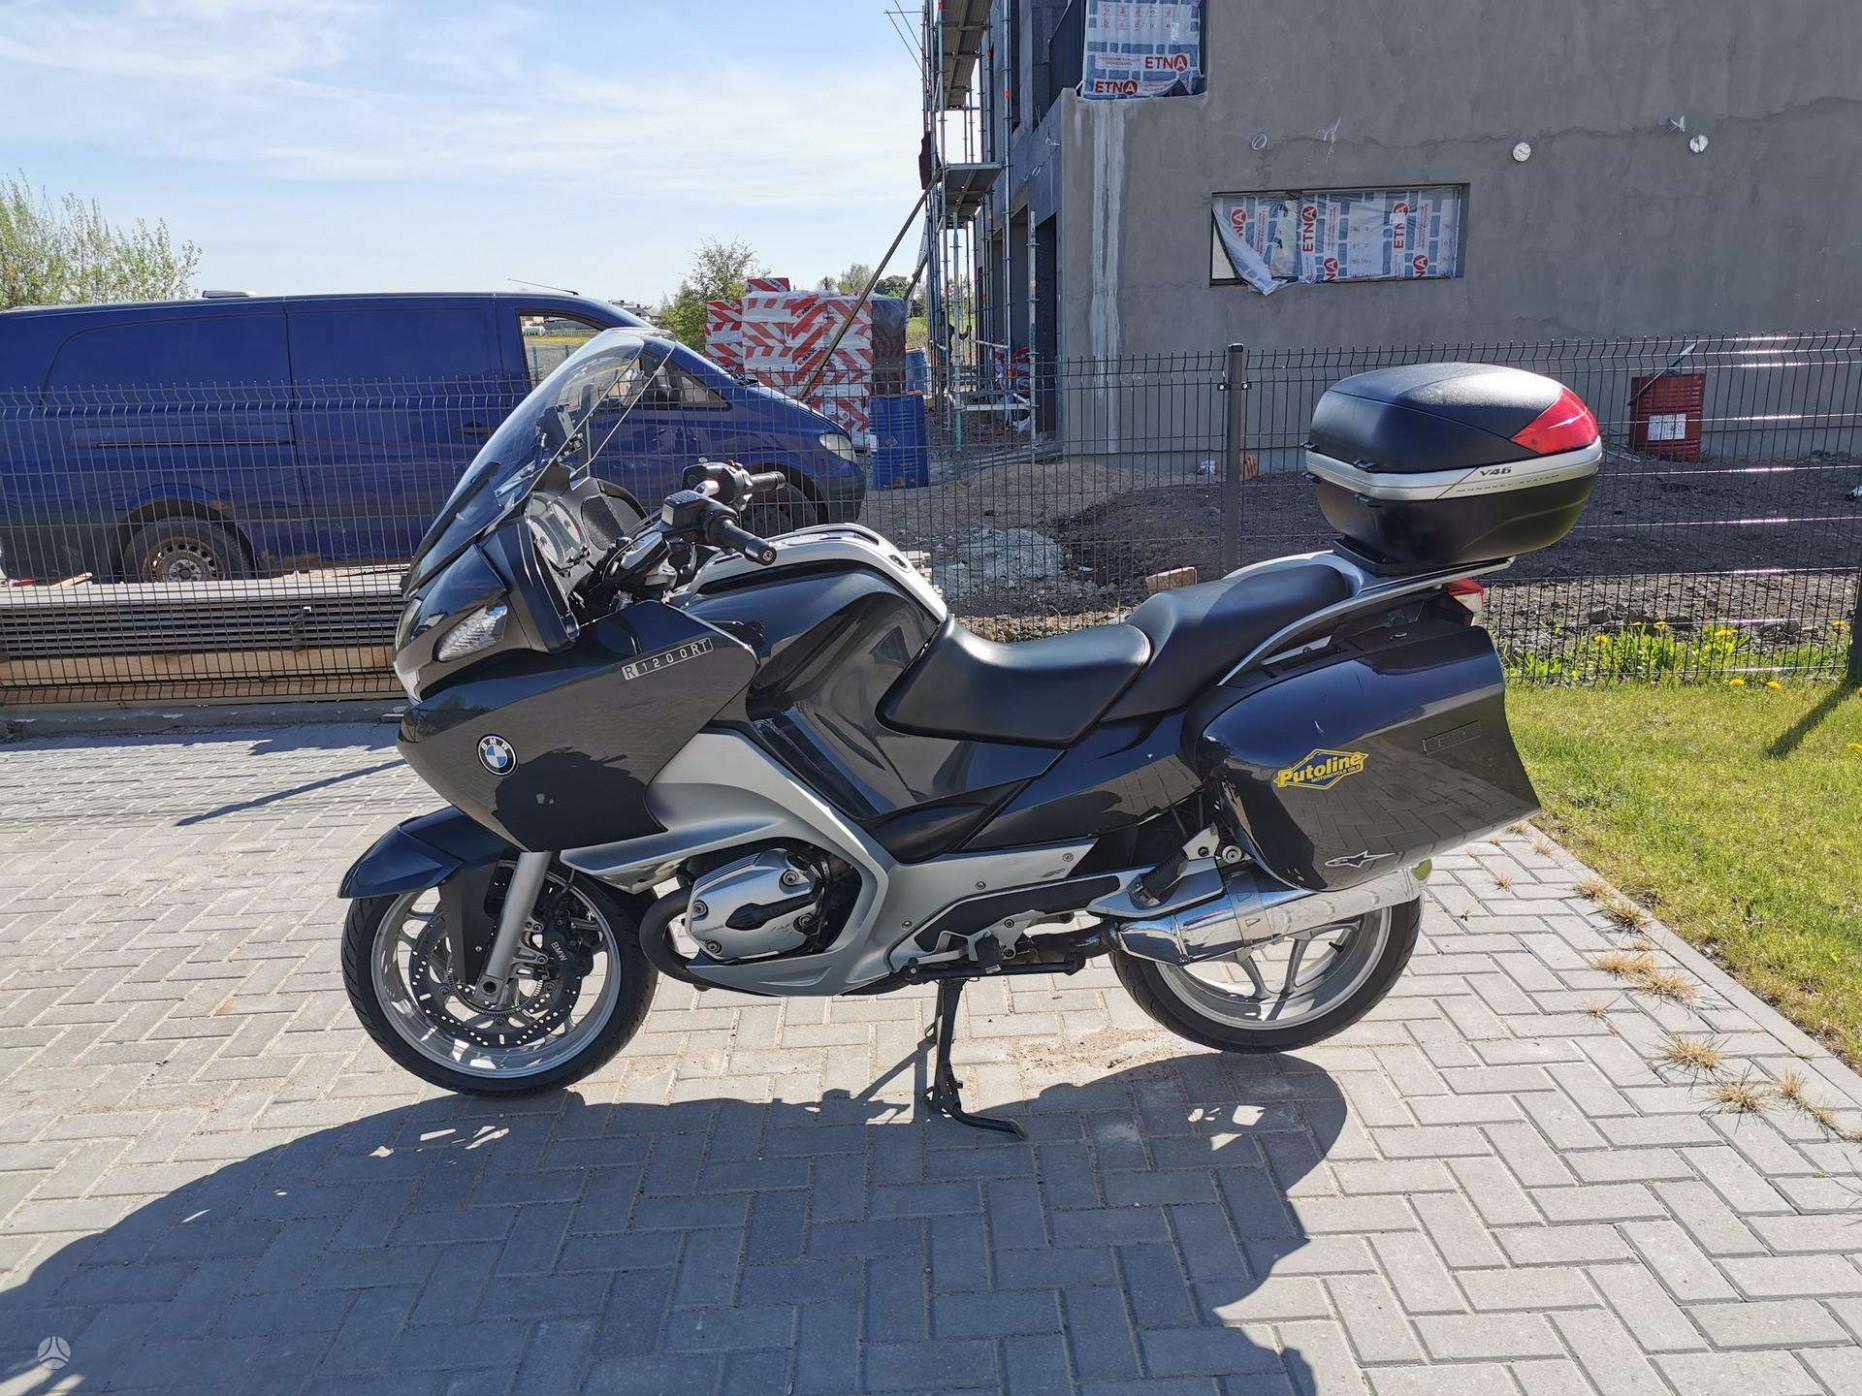 Pricing BMW Rt 2022